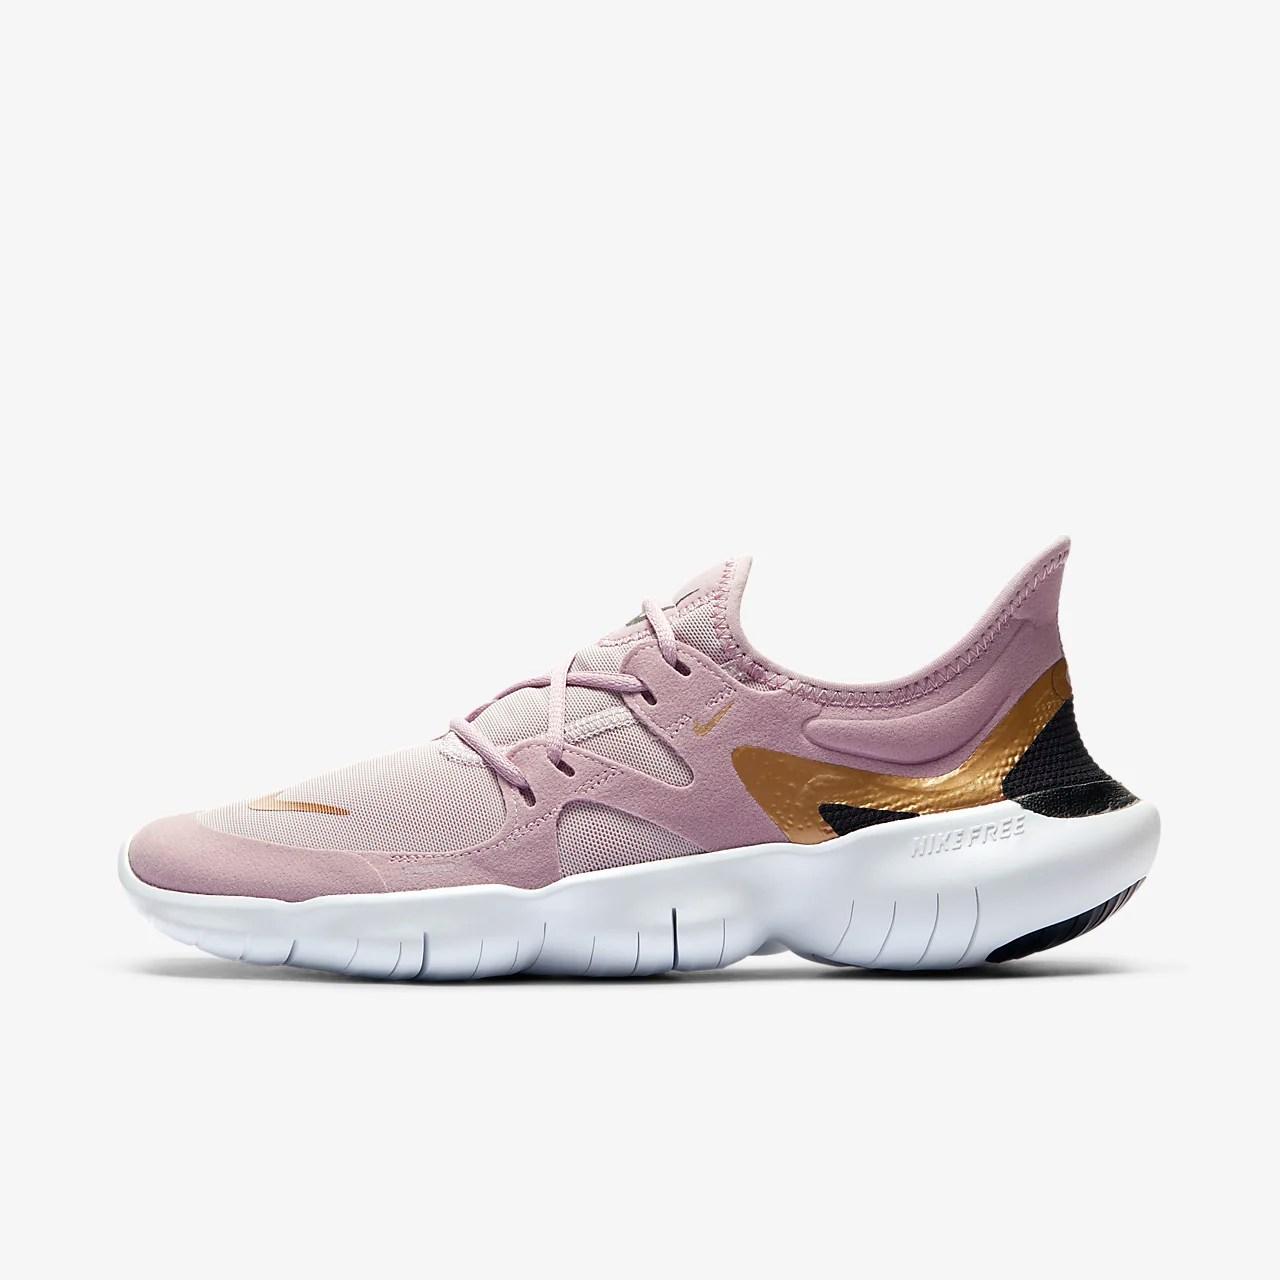 Nike Free RN 5.0 女款跑鞋. Nike TW